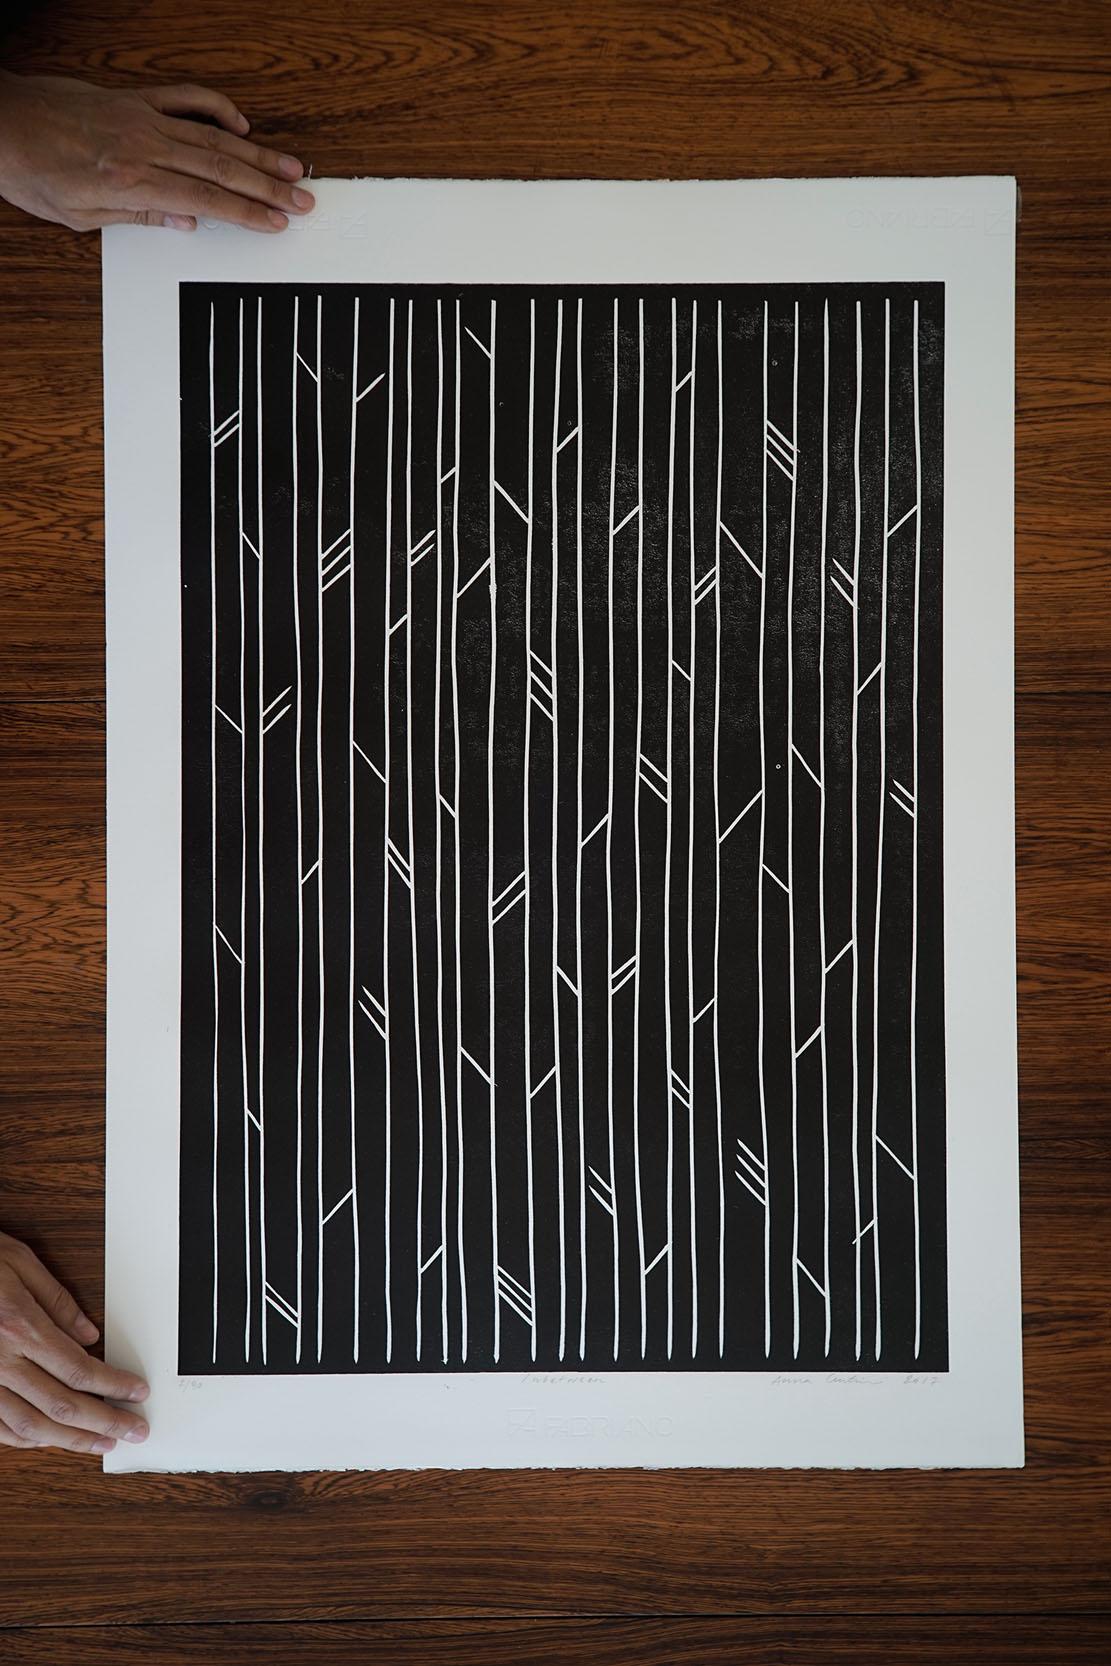 In Between (and who is looking?), Linocut print, 50x70cm